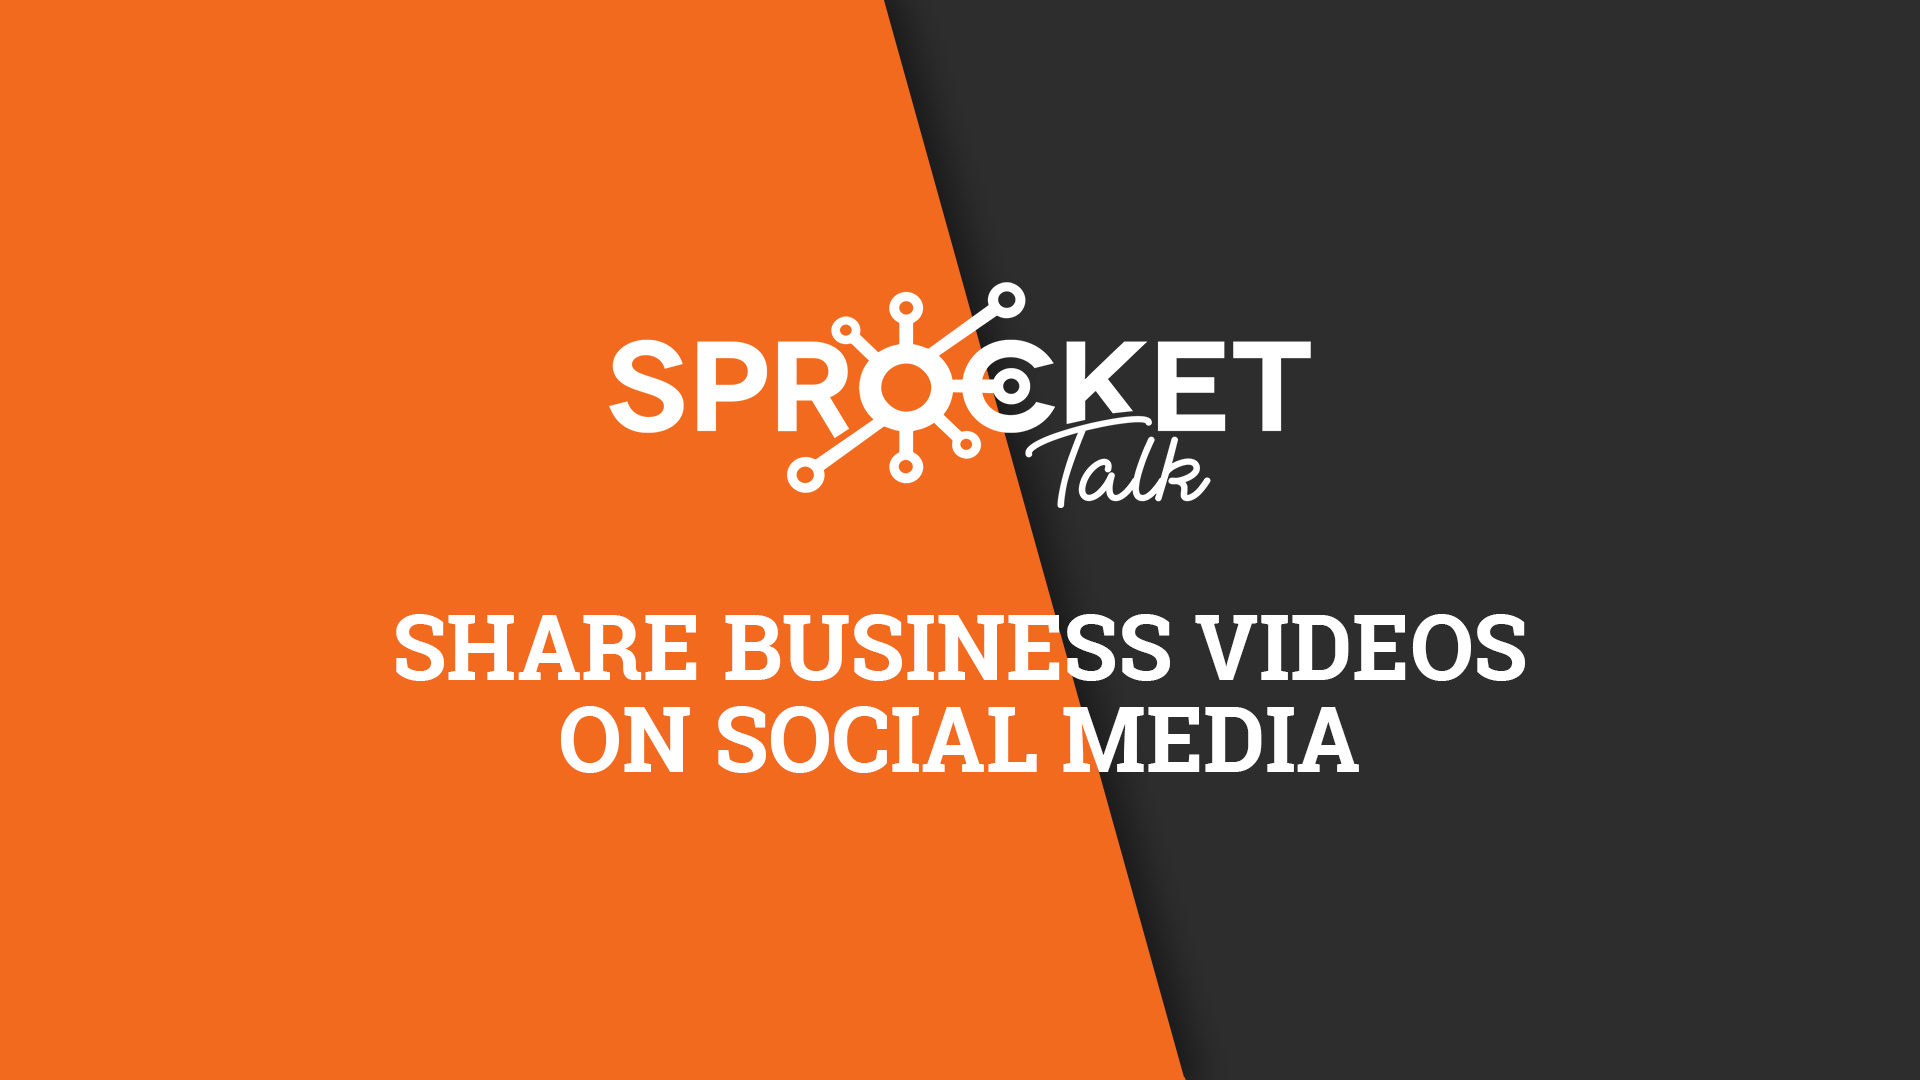 Share Business Videos on Social Media